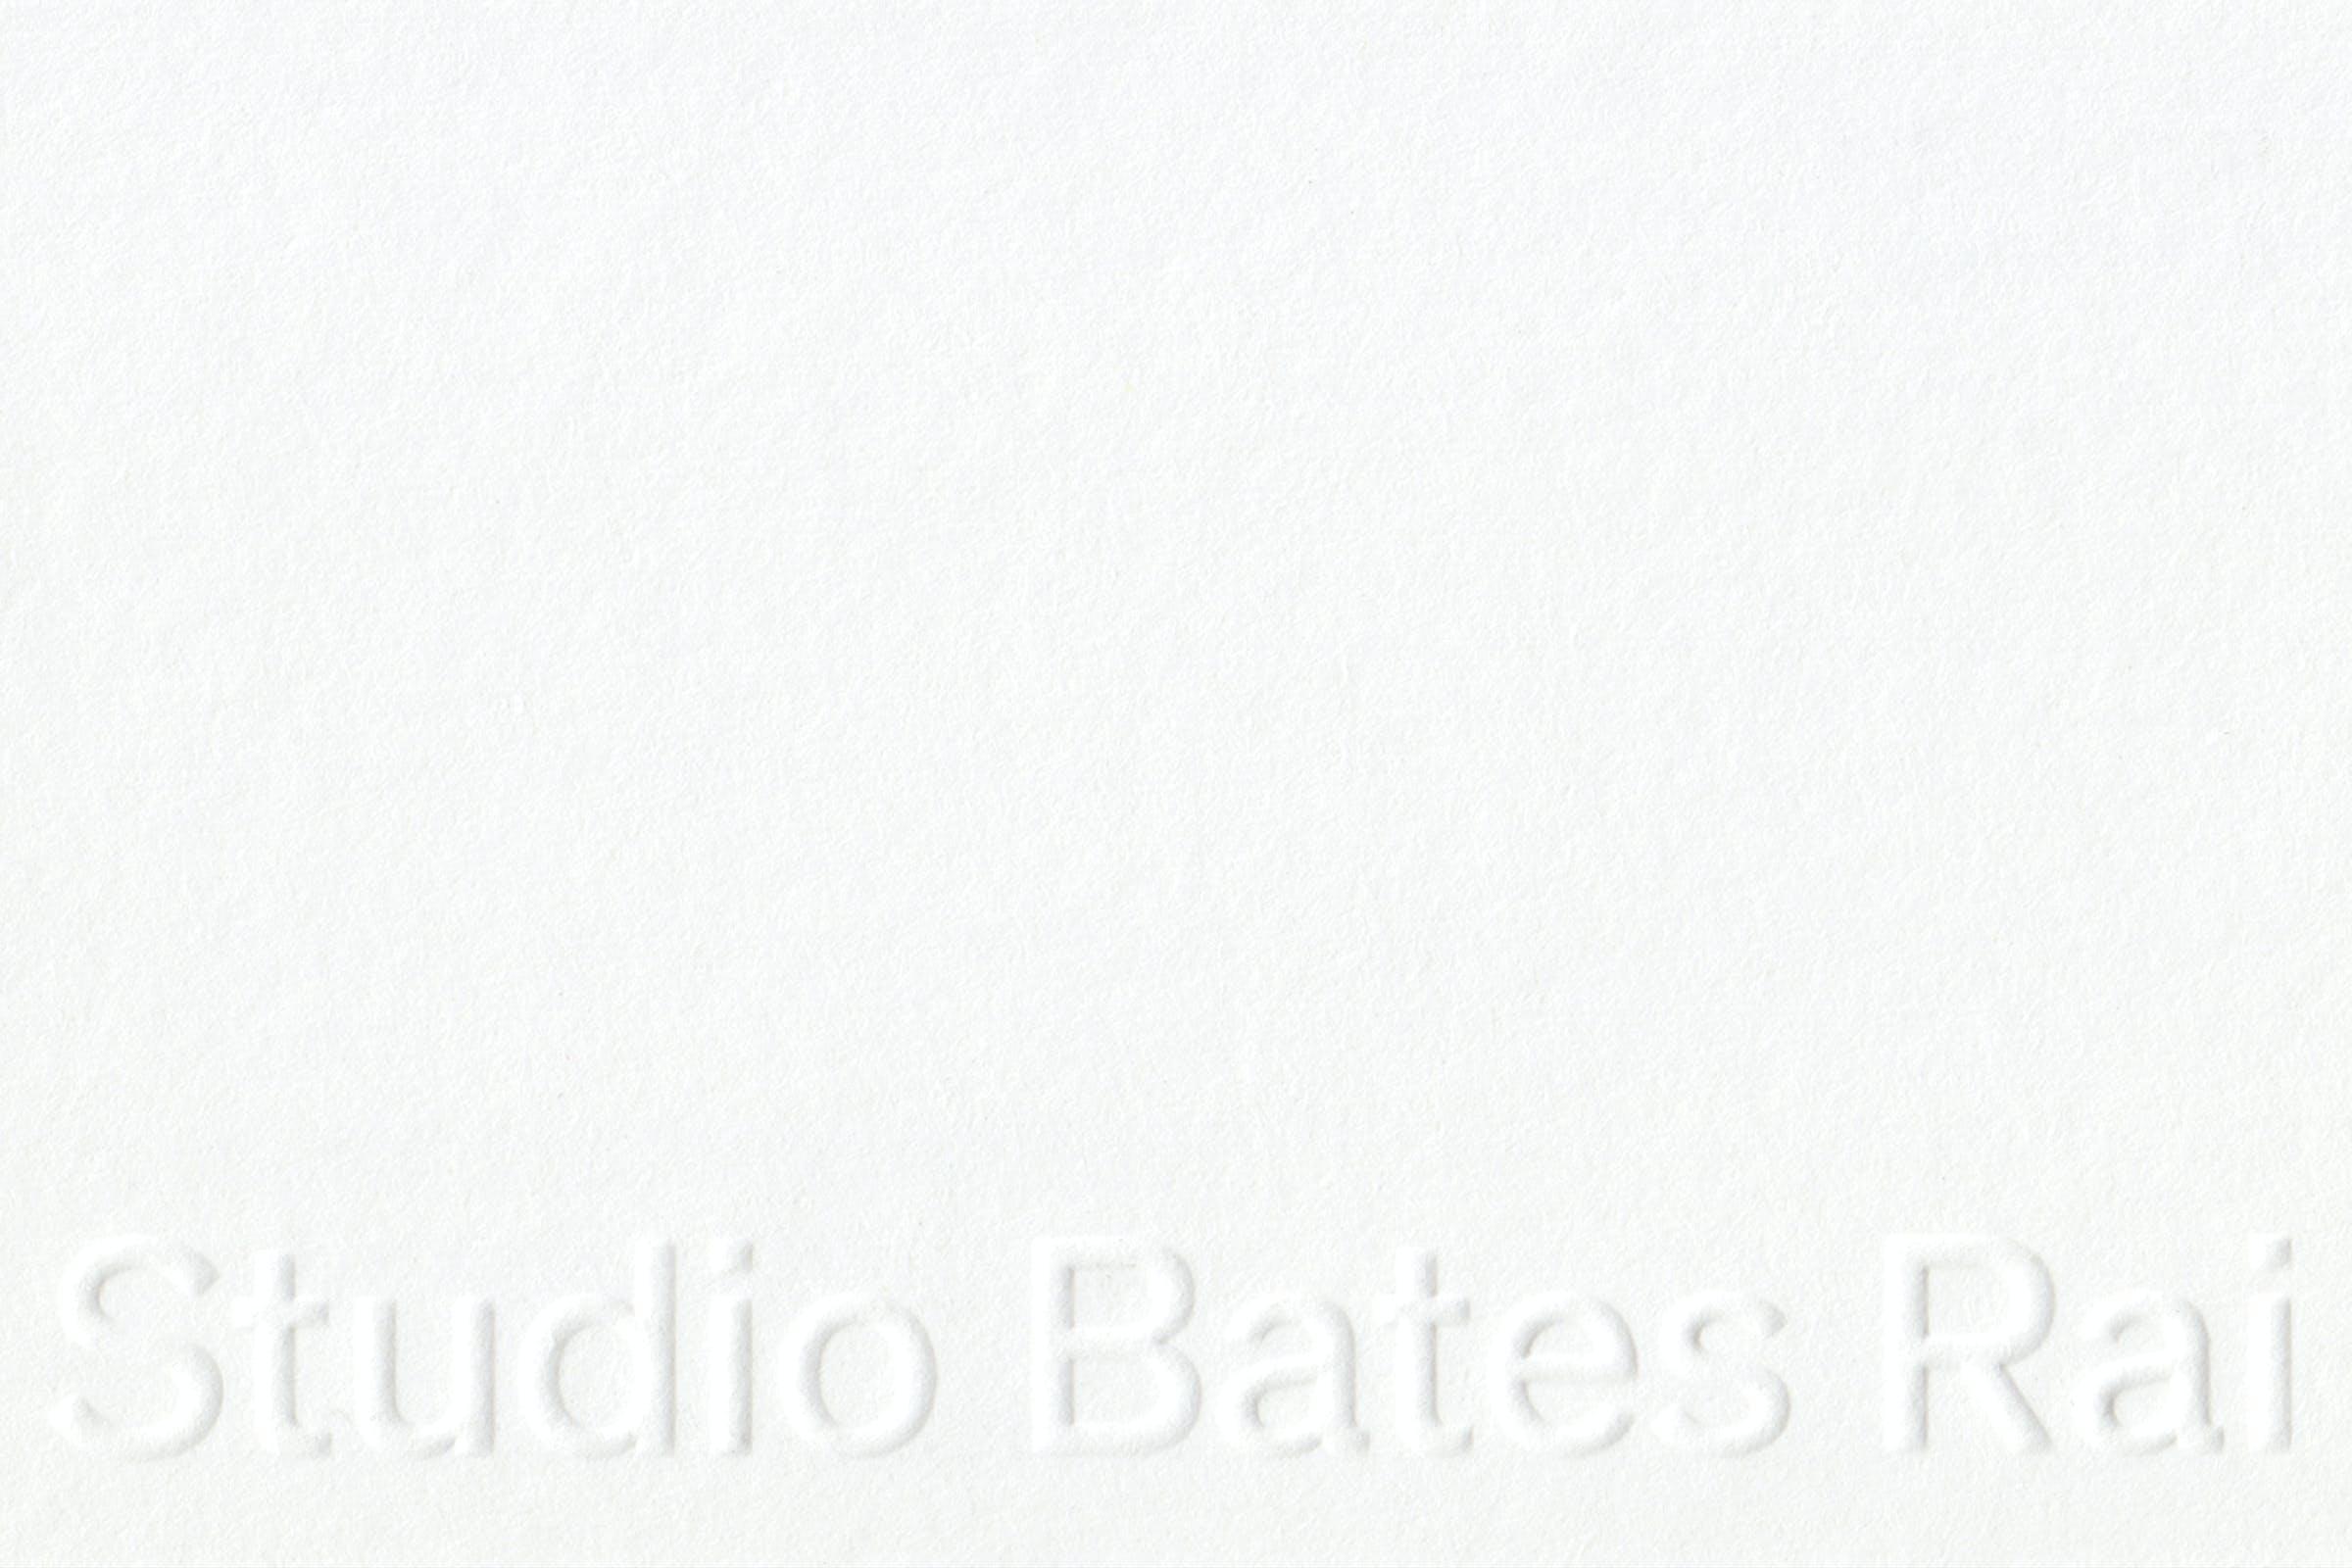 Studio Bates Rai, identity, Graphic Design by Wolfe Hall